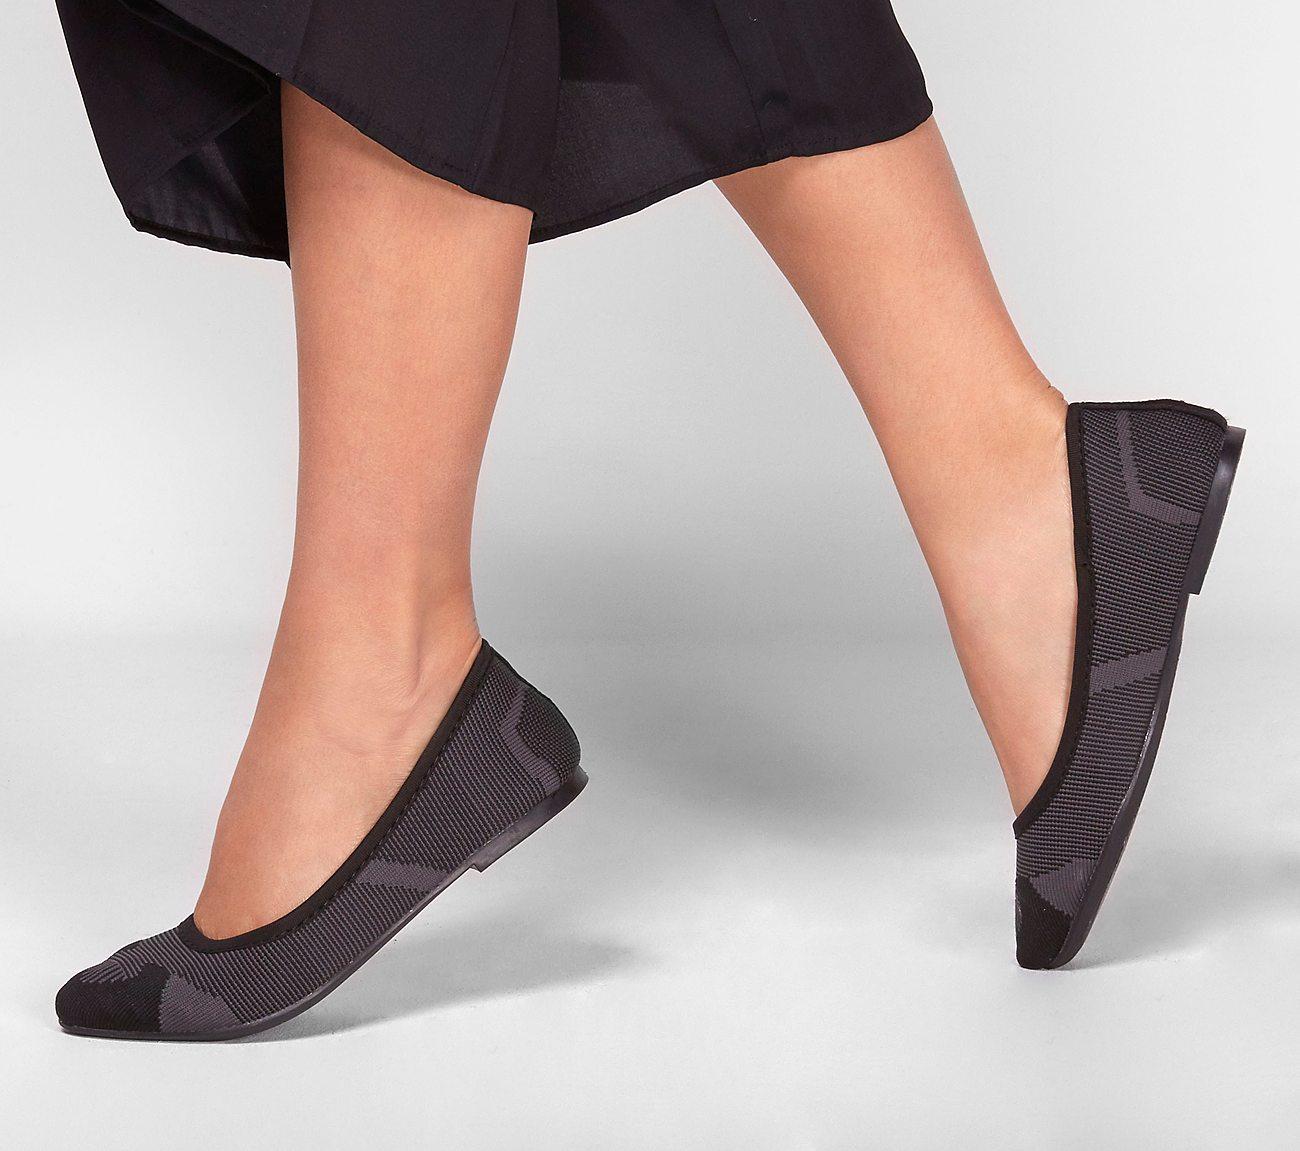 Skechers 48487 BKCC Cleo Wham Black Charcoal Flats Shoes